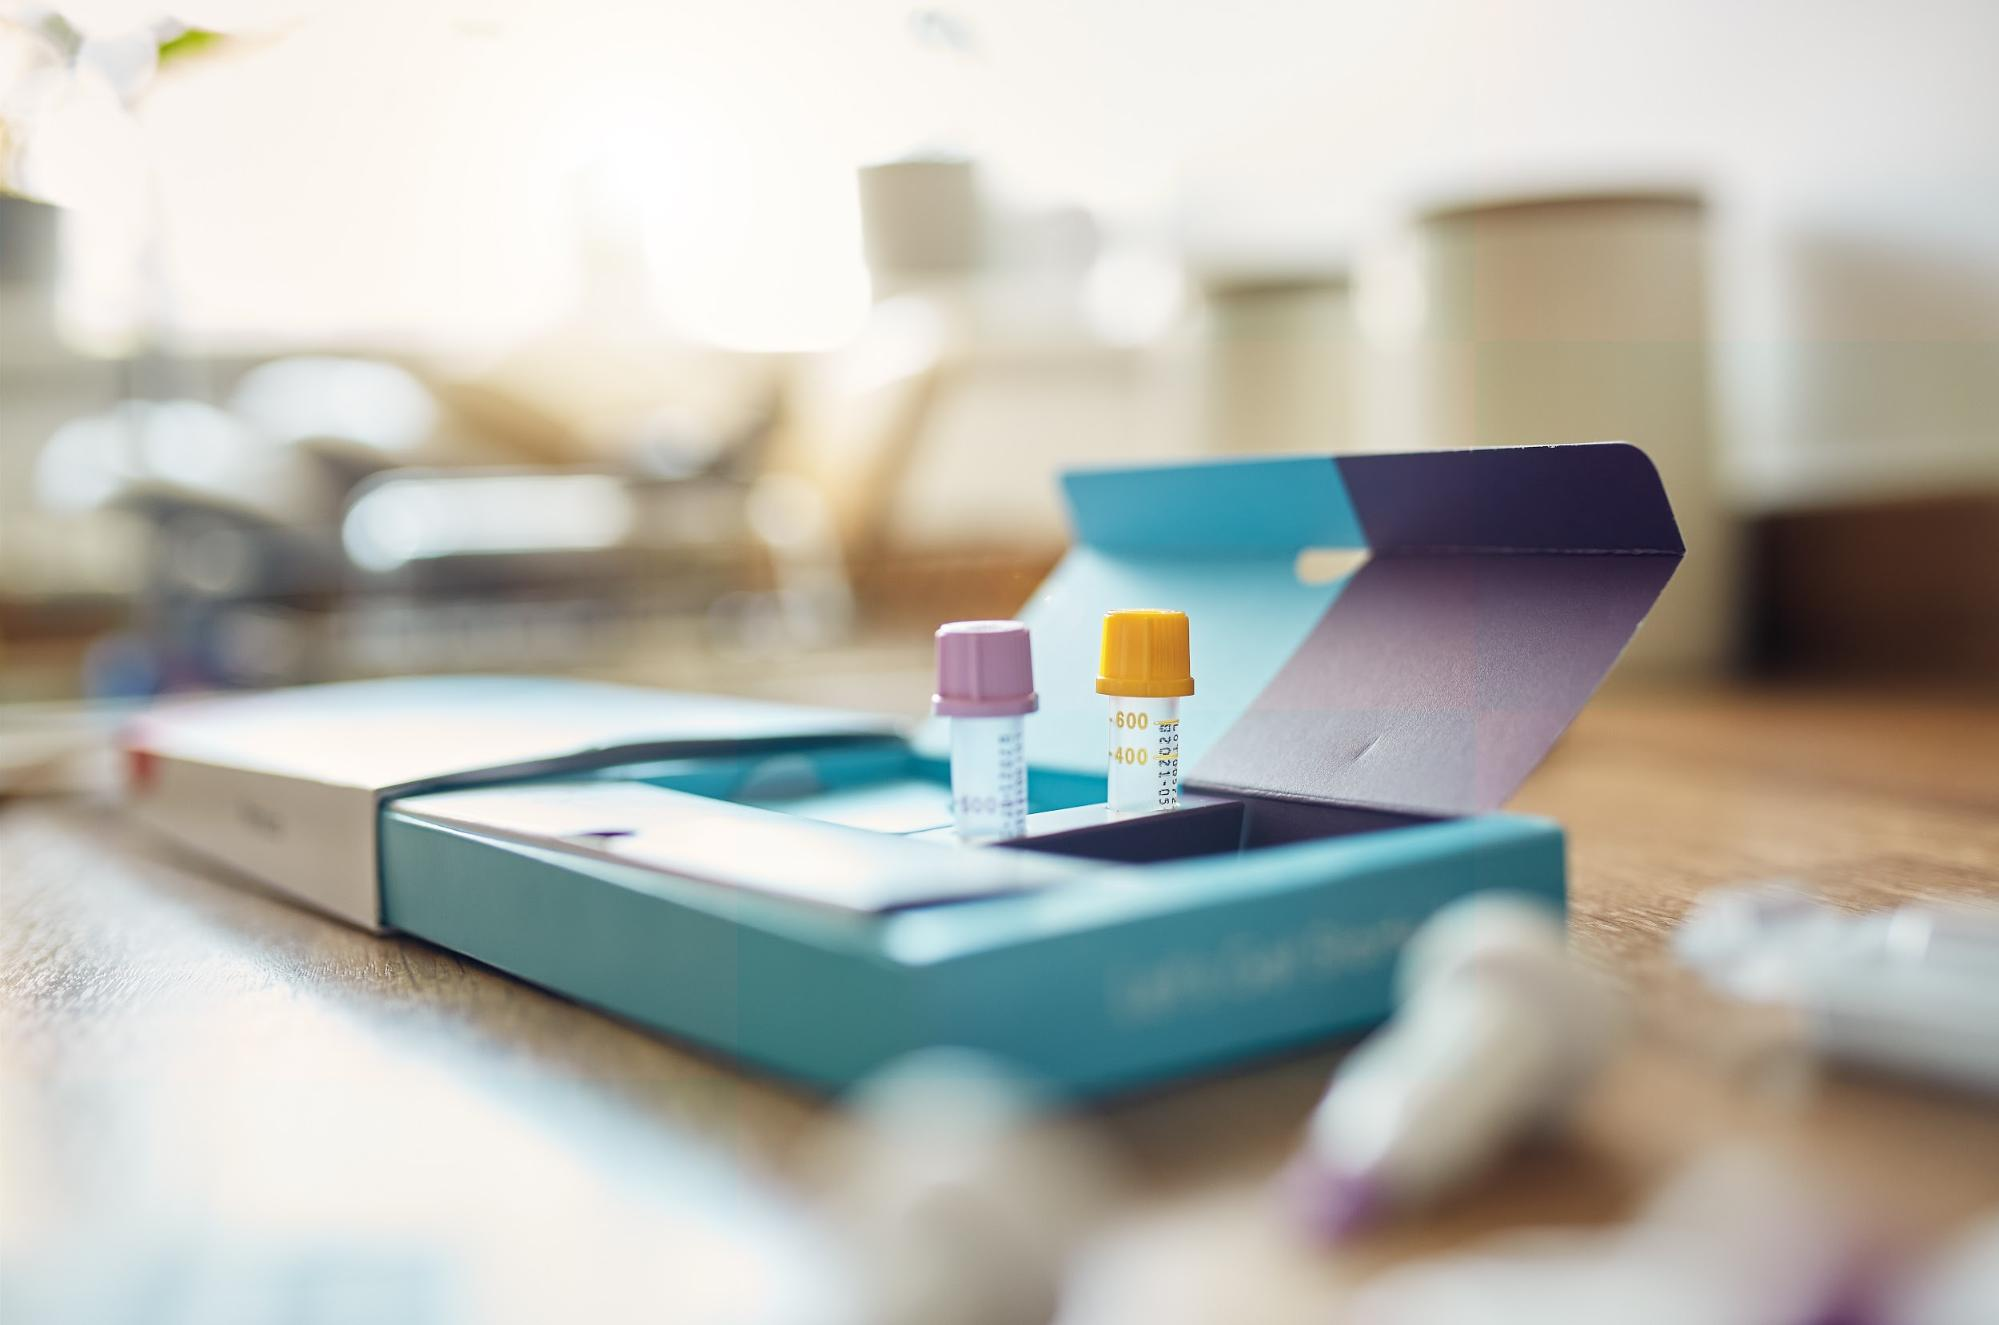 Mycotoxin Testing: Testing kit on a table